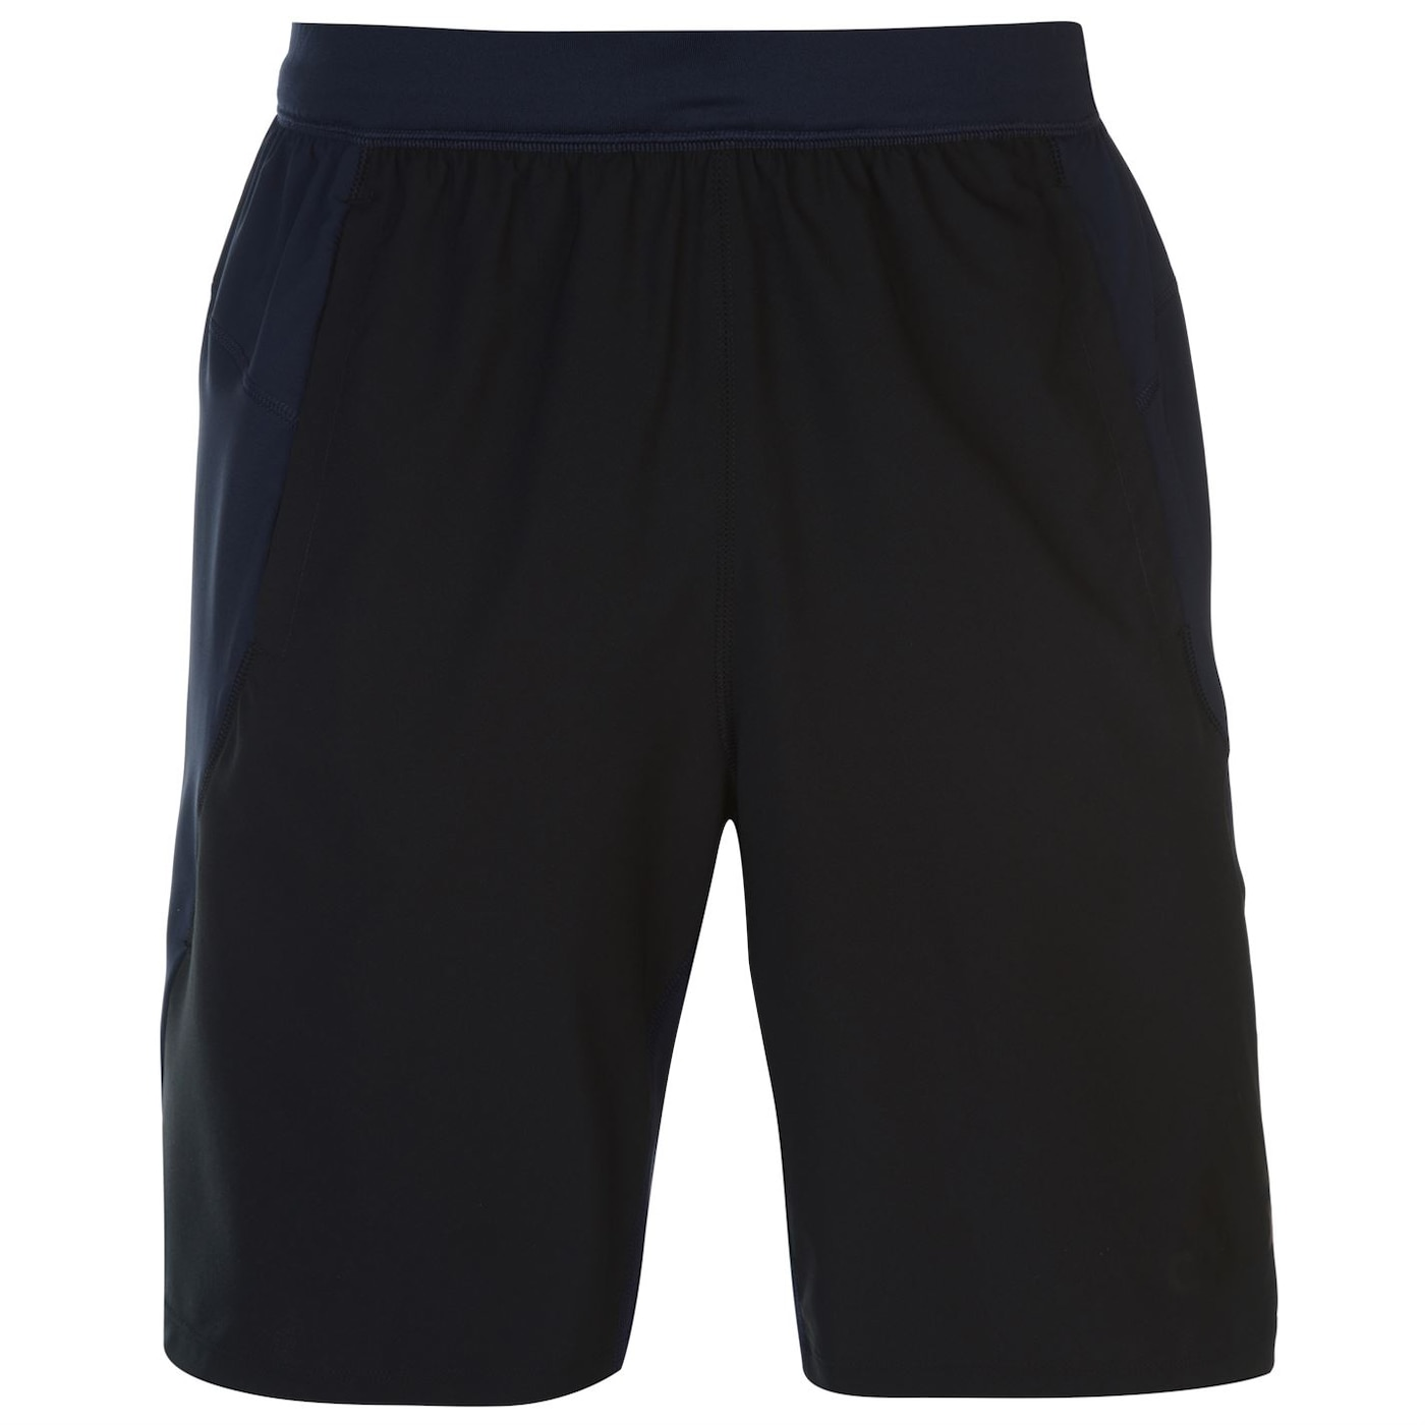 Adidas 4KRFT Woven 10 Inch Shorts Mens